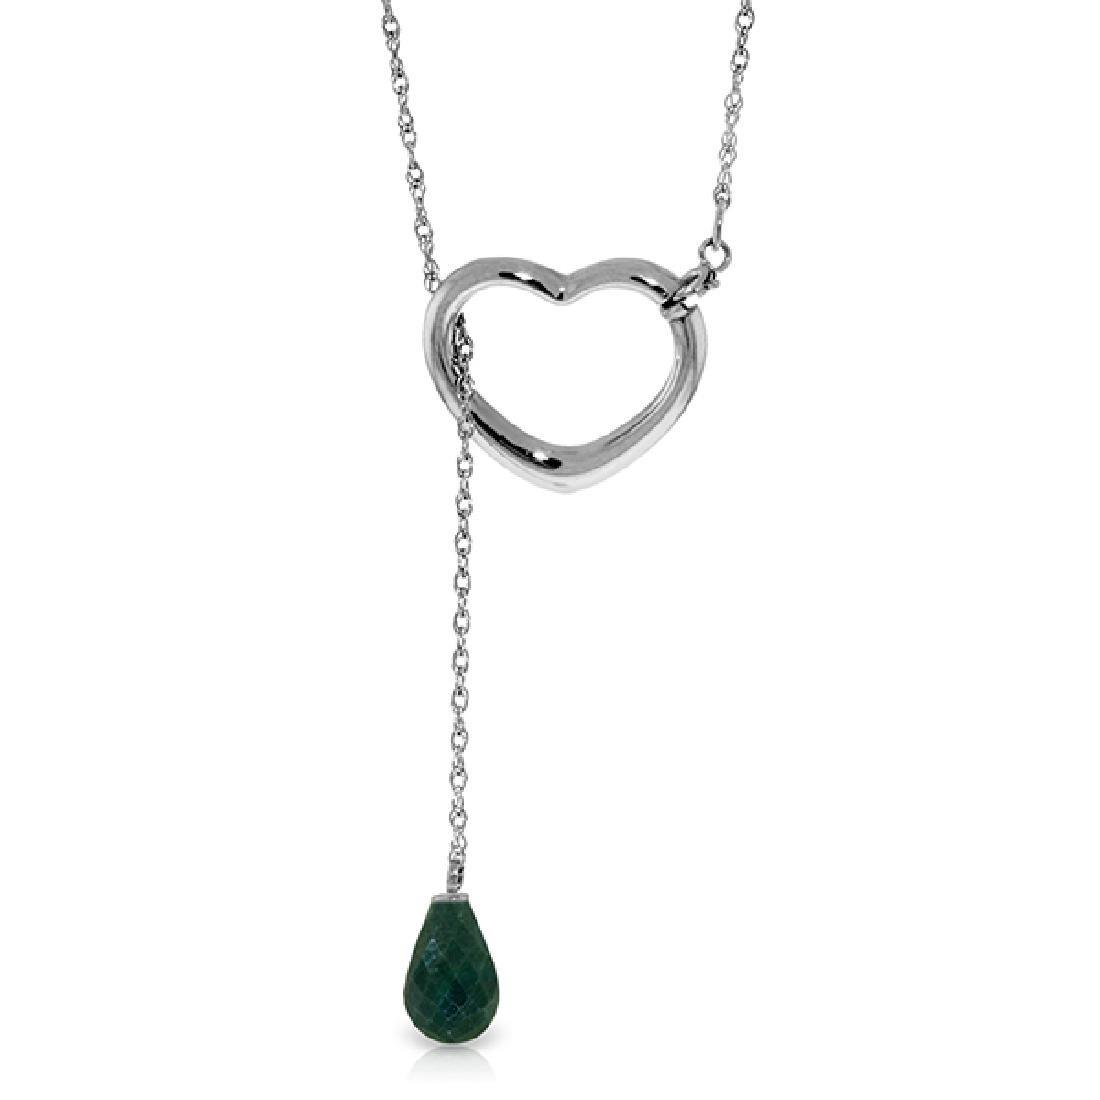 Genuine 3.3 ctw Emerald Necklace Jewelry 14KT White